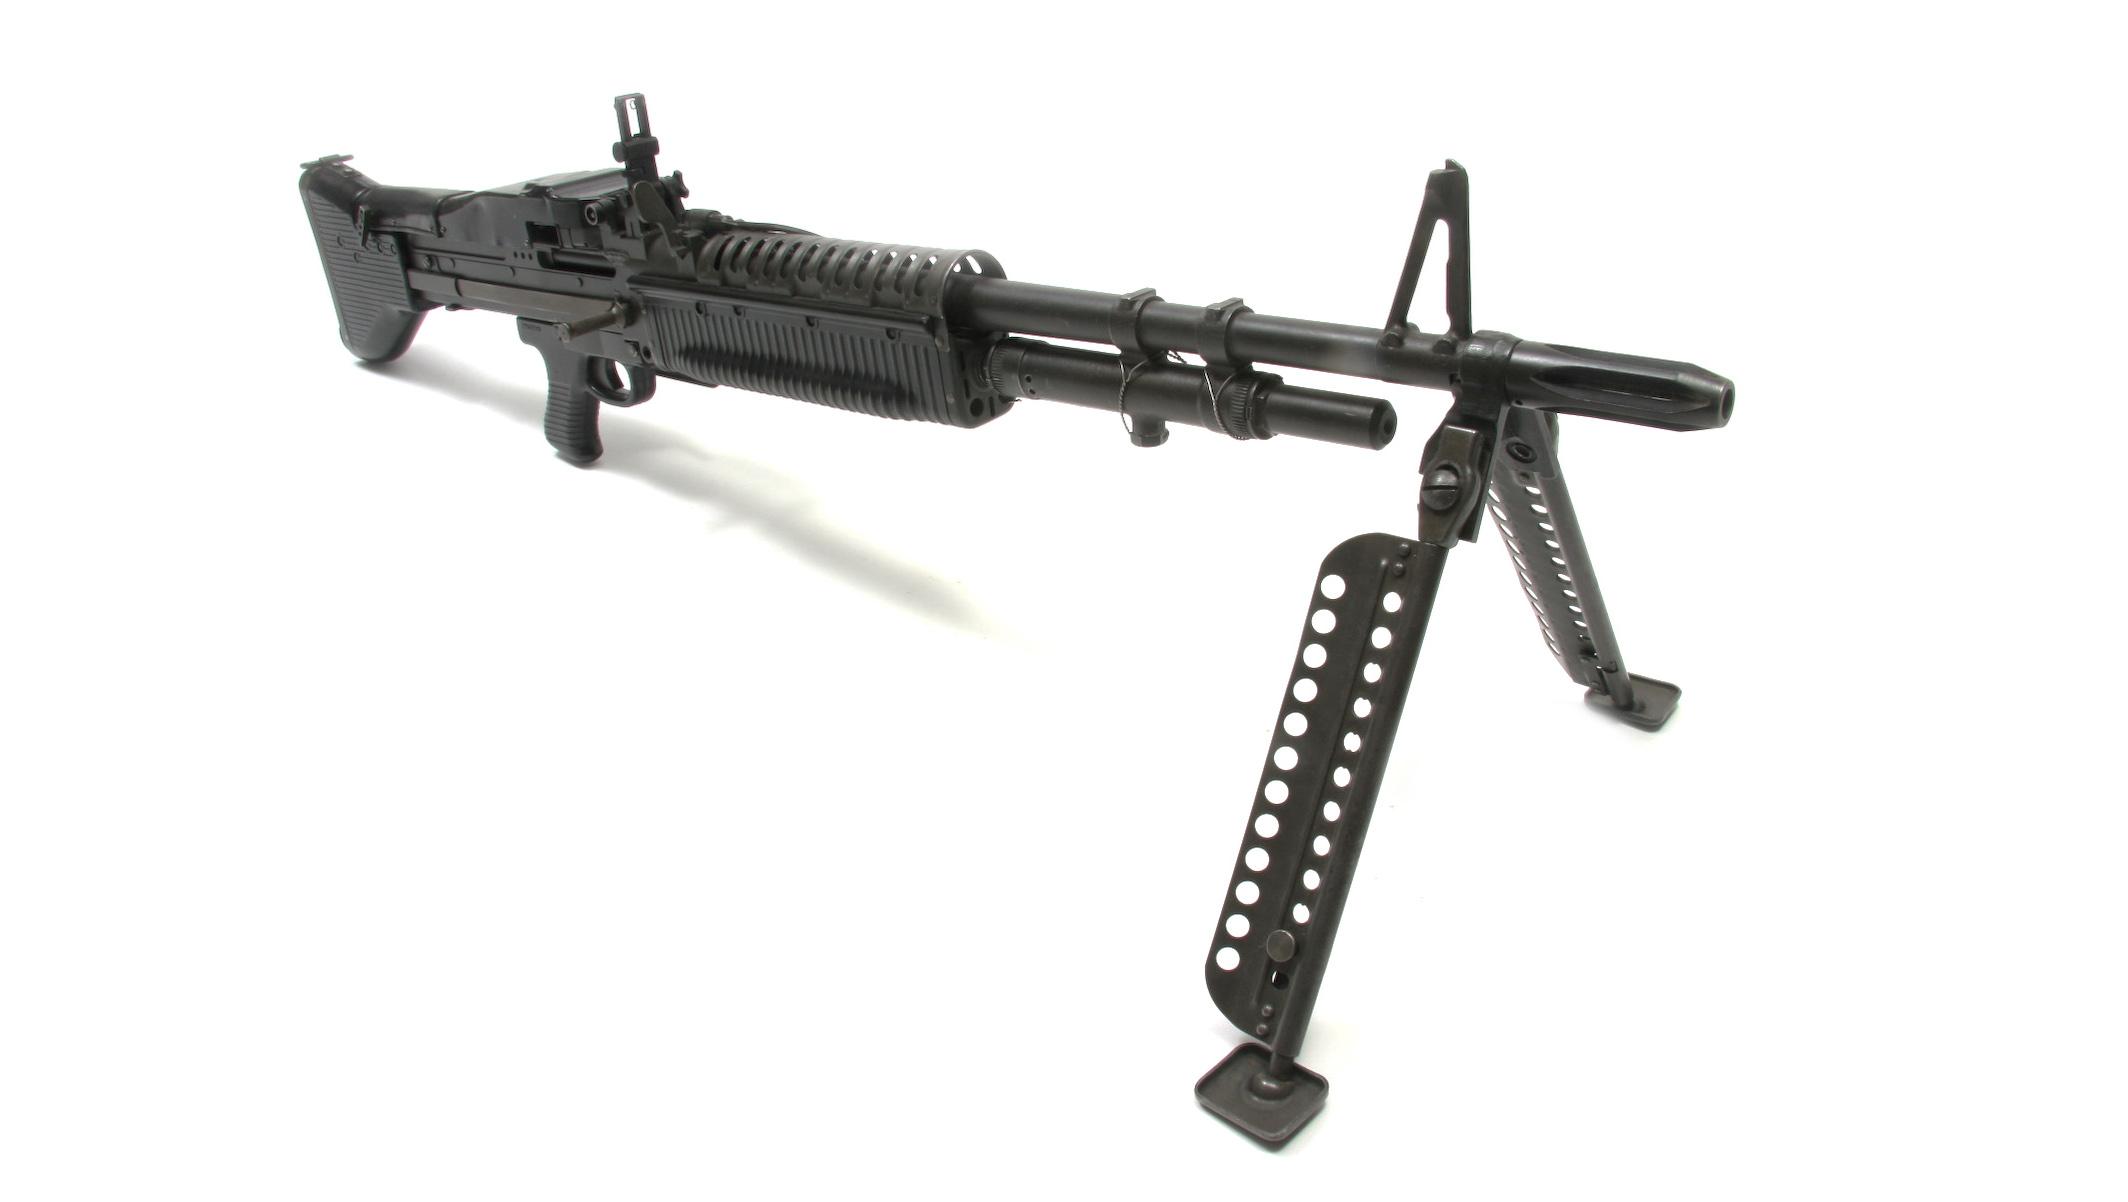 M60 MACHINE GUN military rifle weapon g wallpaper background 2128x1202